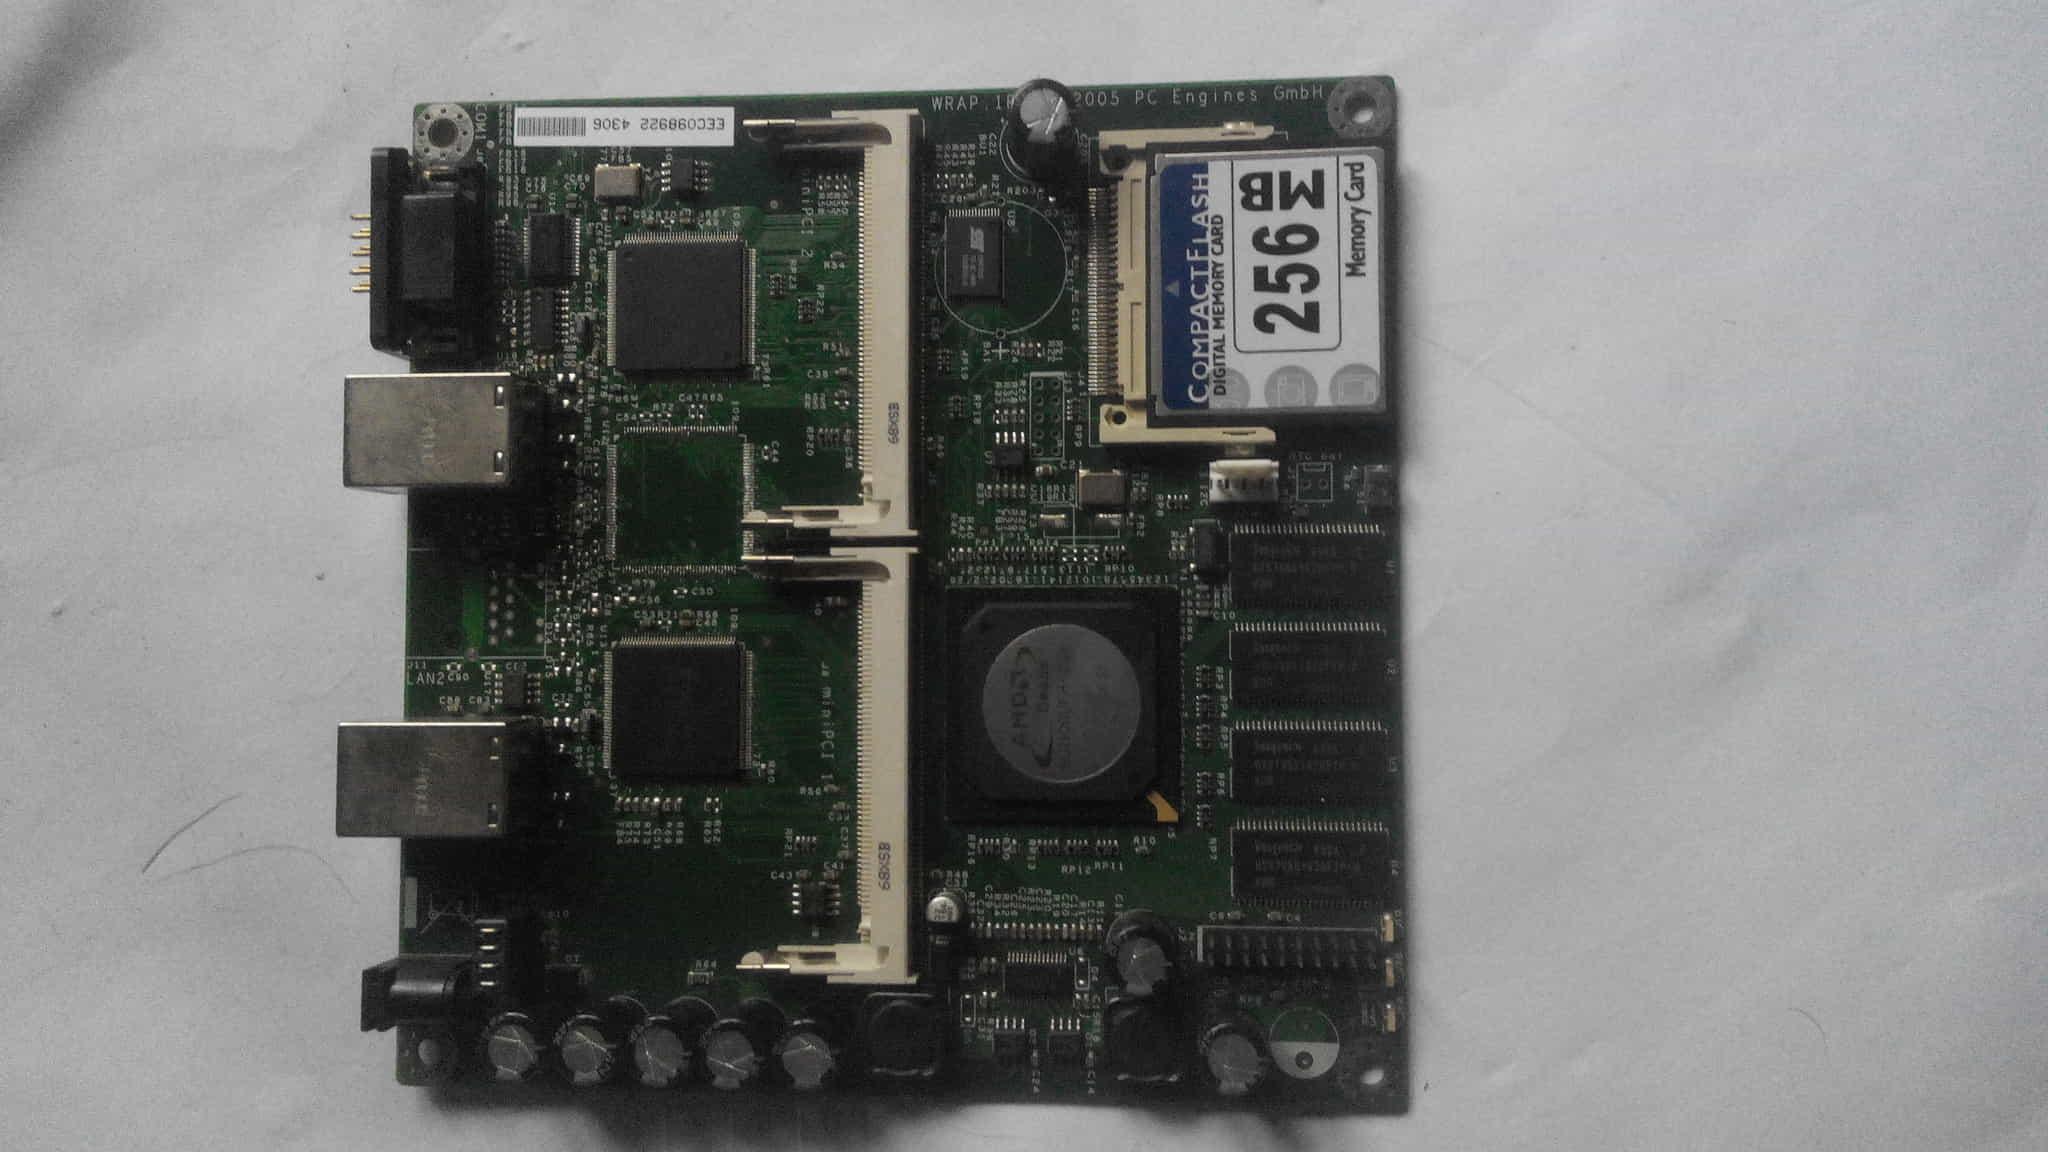 Jual Alix wrap1e1 PC Engine Alix wrap 1e 1 OS mikrotik M Fashion